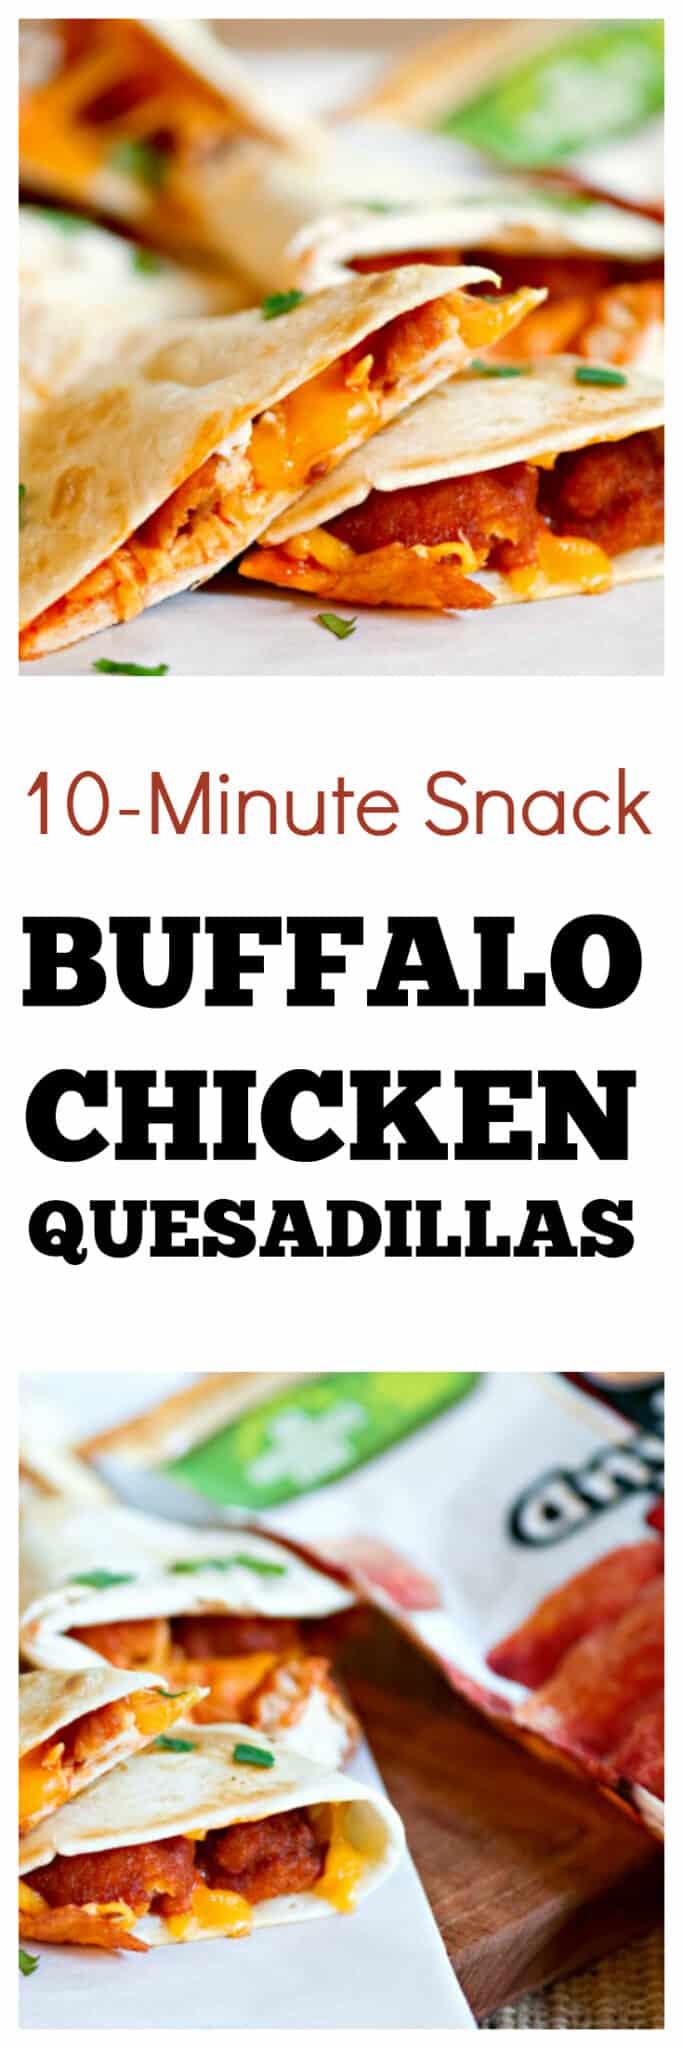 Buffalo Chicken Quesadilla Recipe | A quick and easy 10-minute snack. #snackideas #cheesy